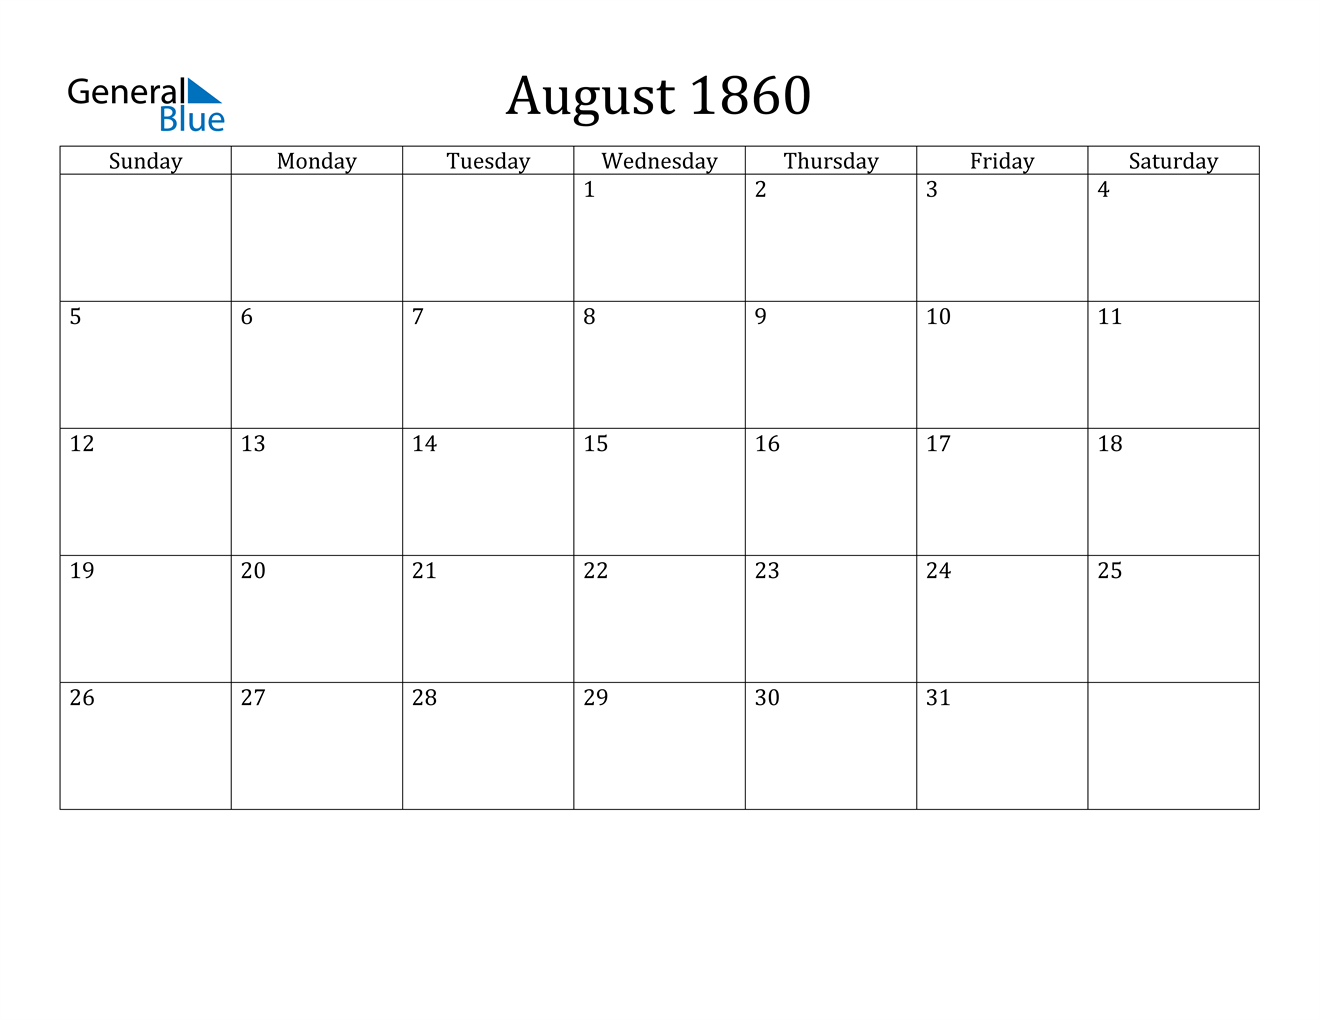 Image of August 1860 Calendar